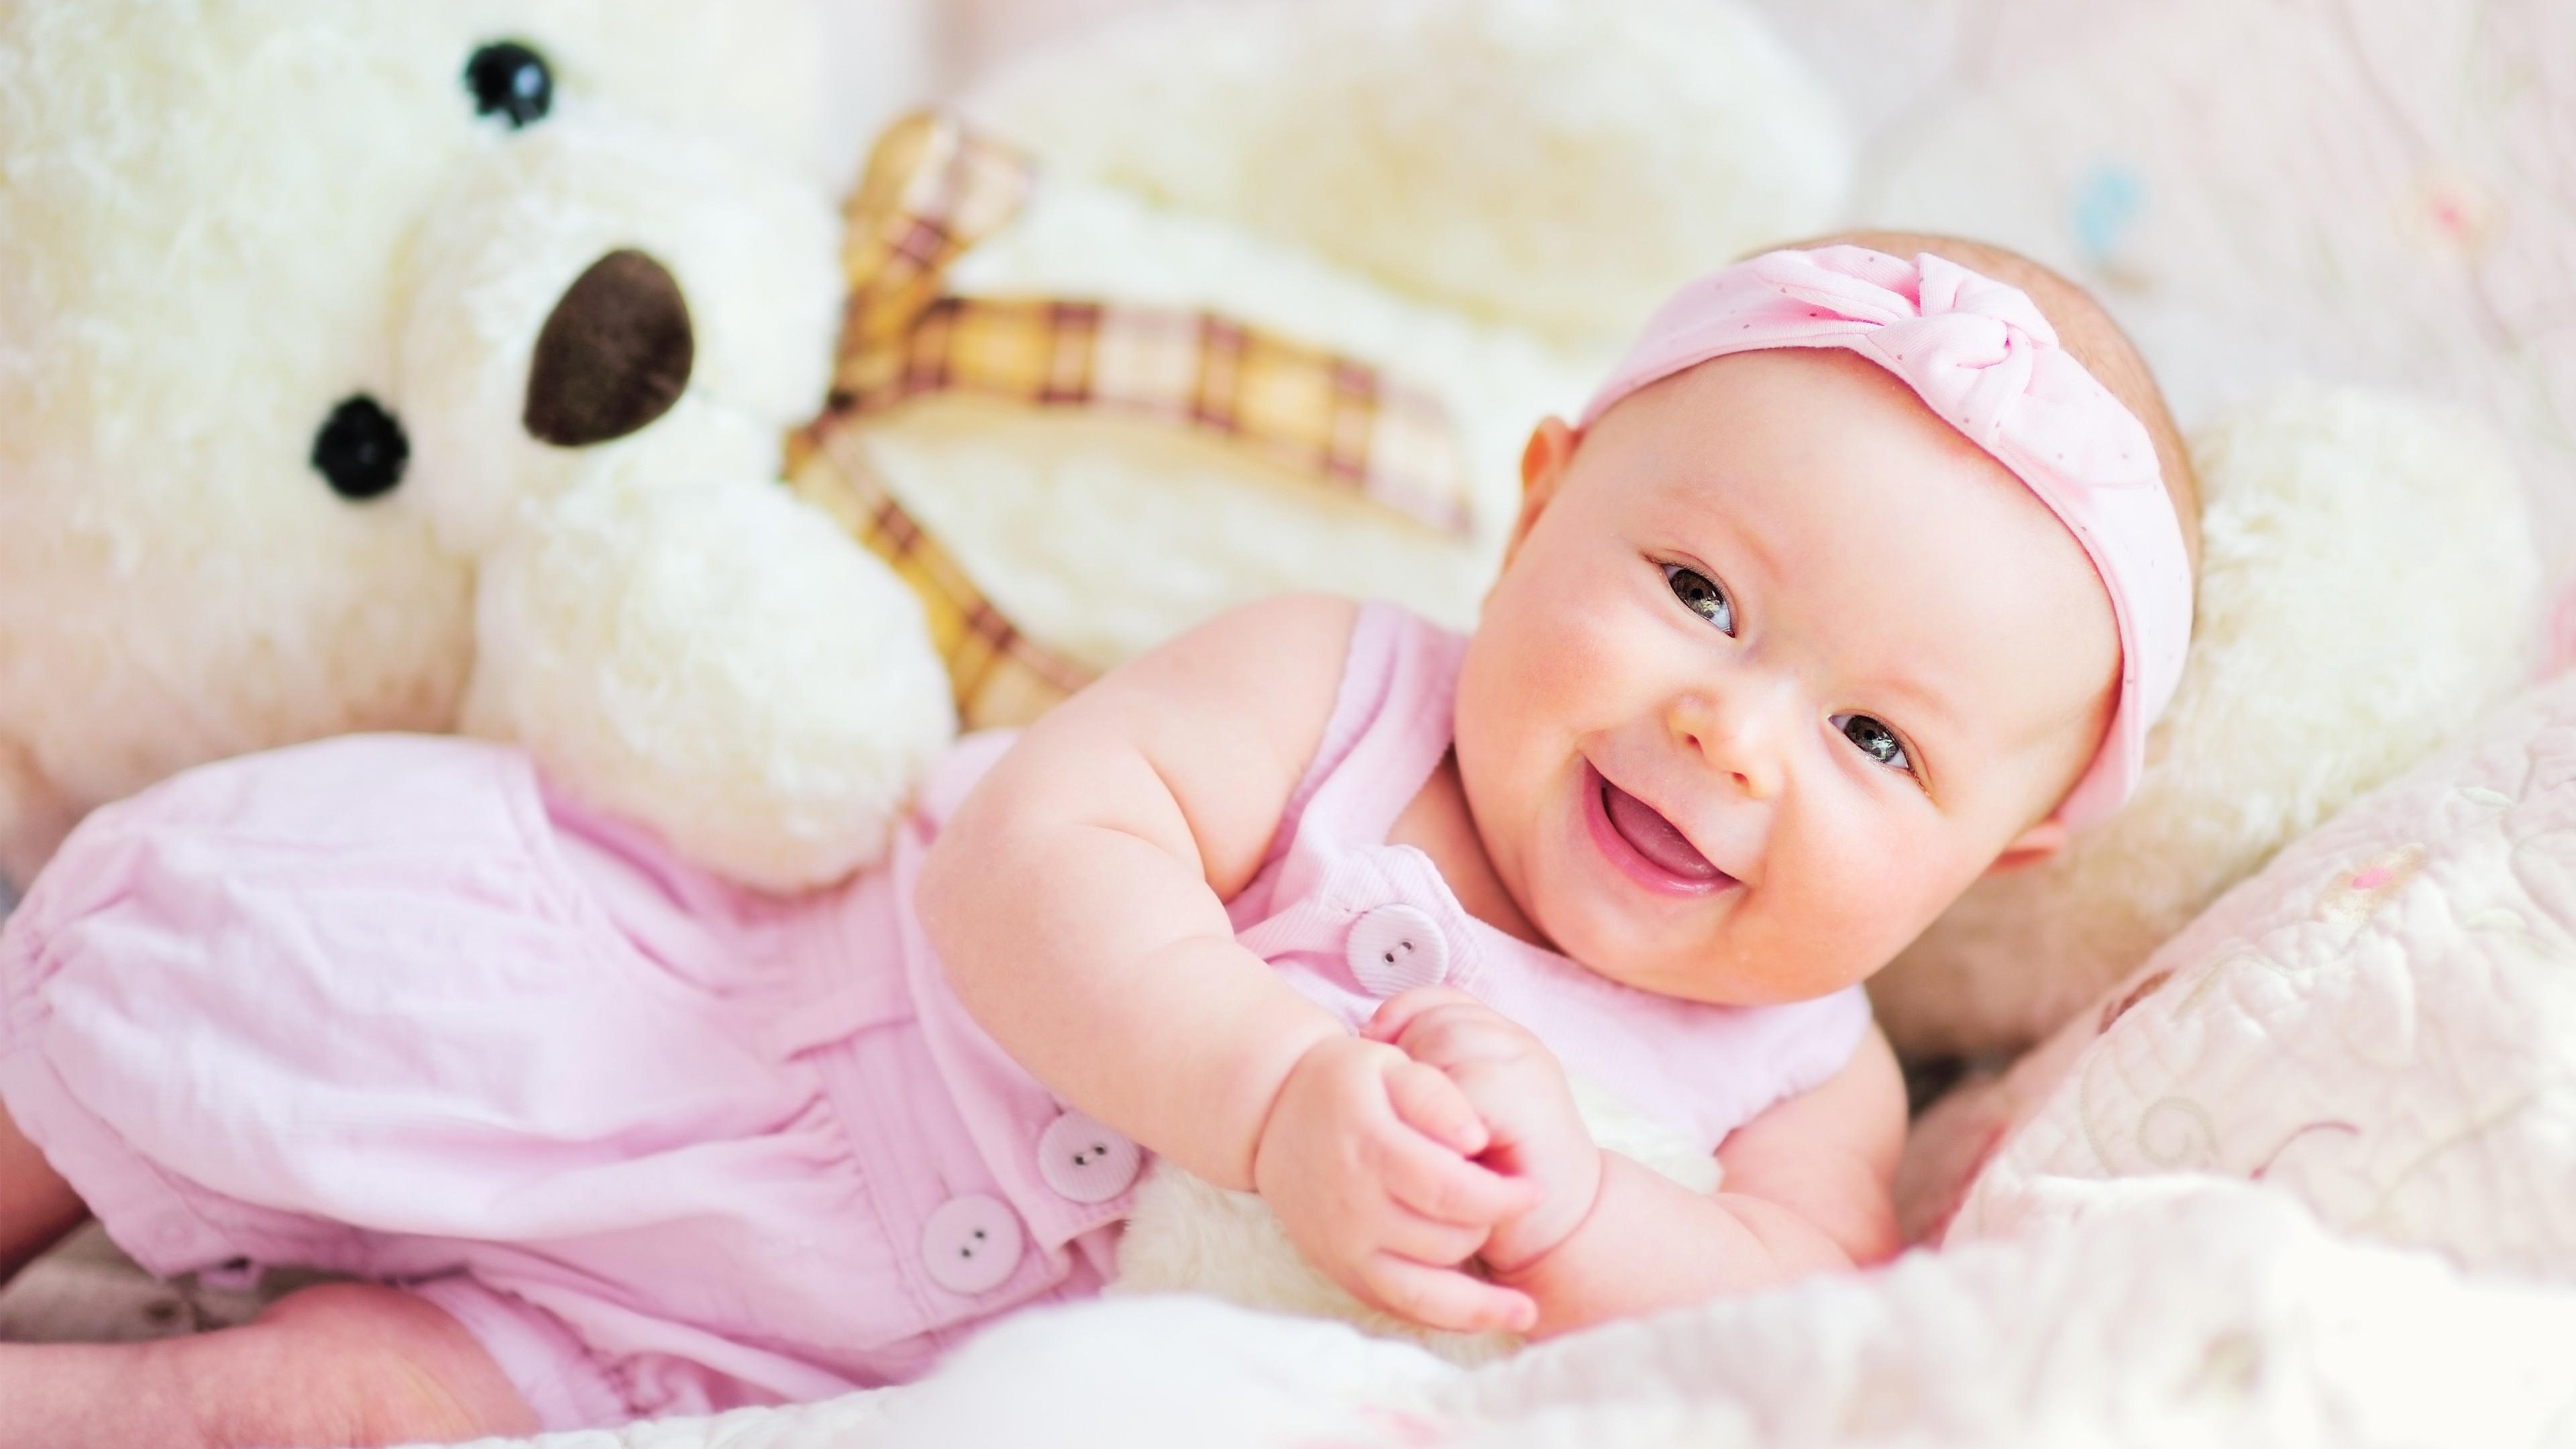 babies free wallpapers Cute Baby Wallpapers So Cute Pinterest